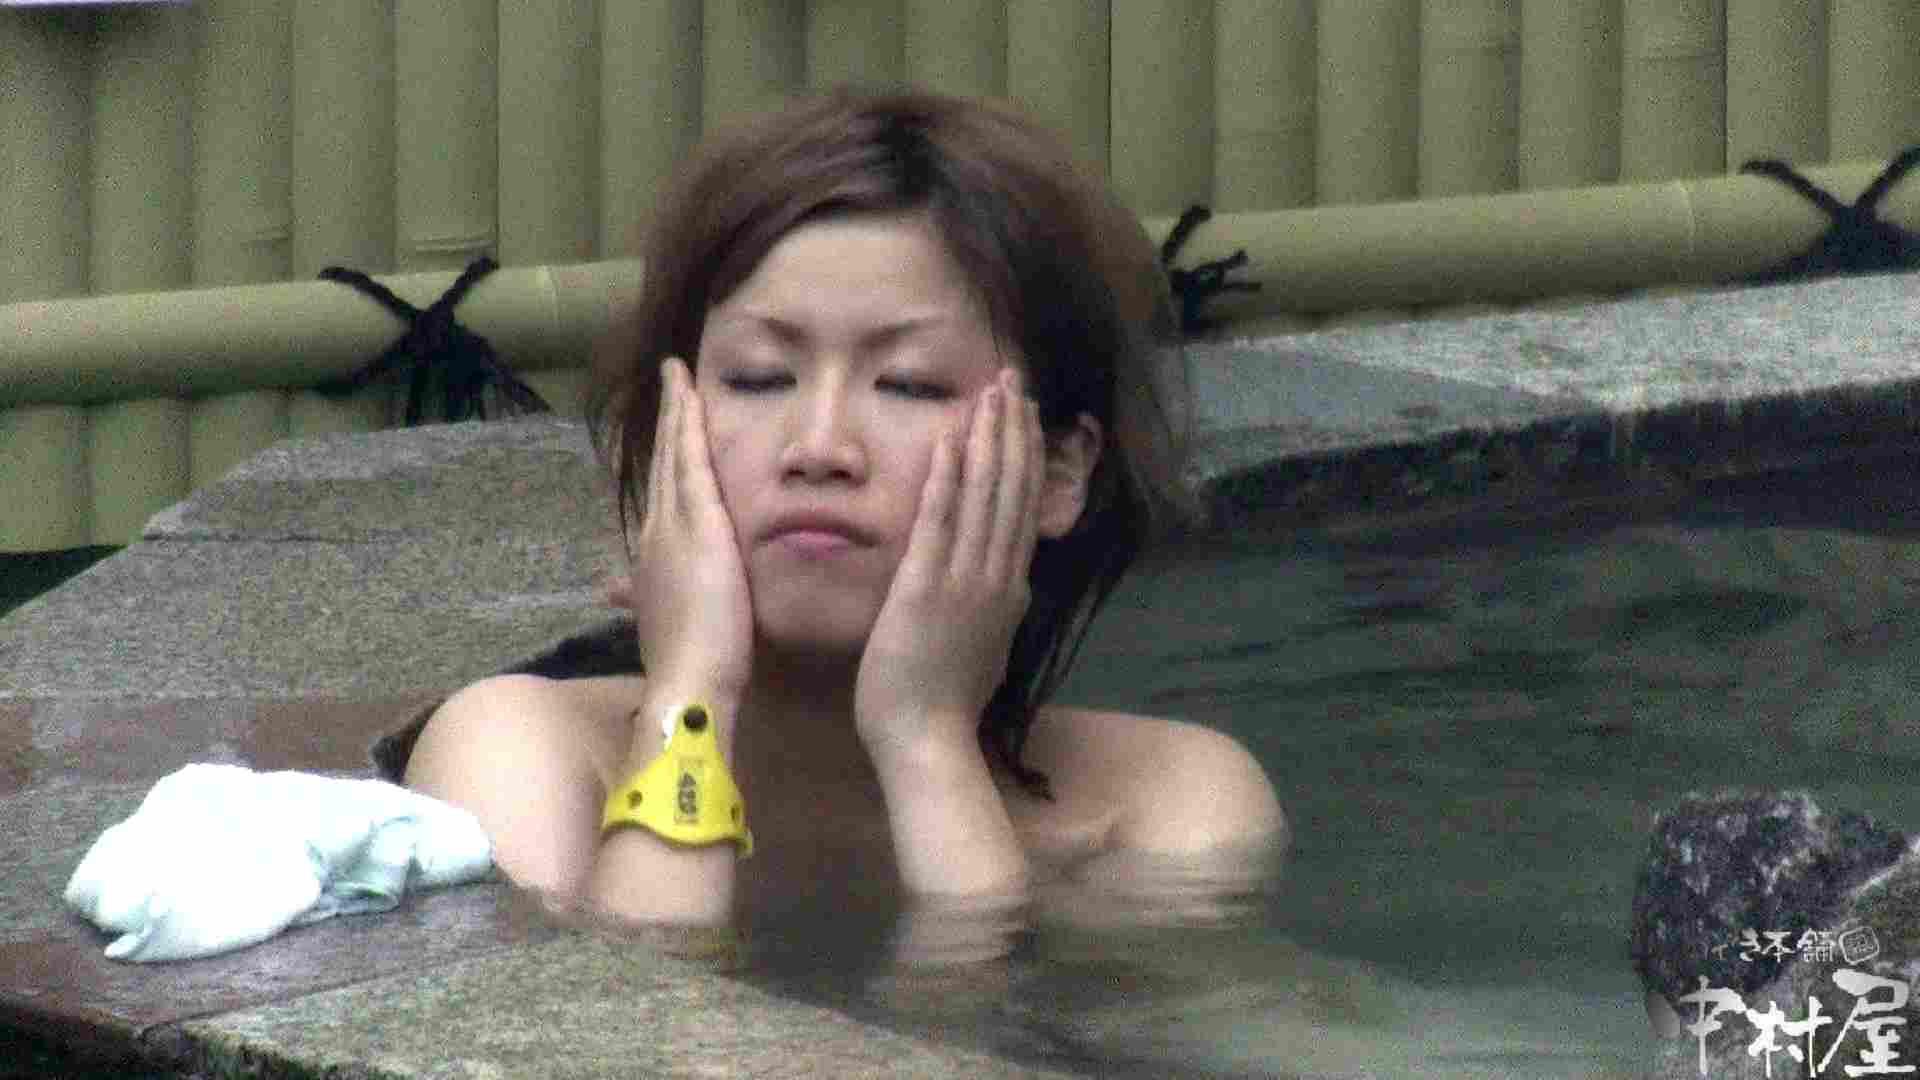 Aquaな露天風呂Vol.918 0  55連発 46